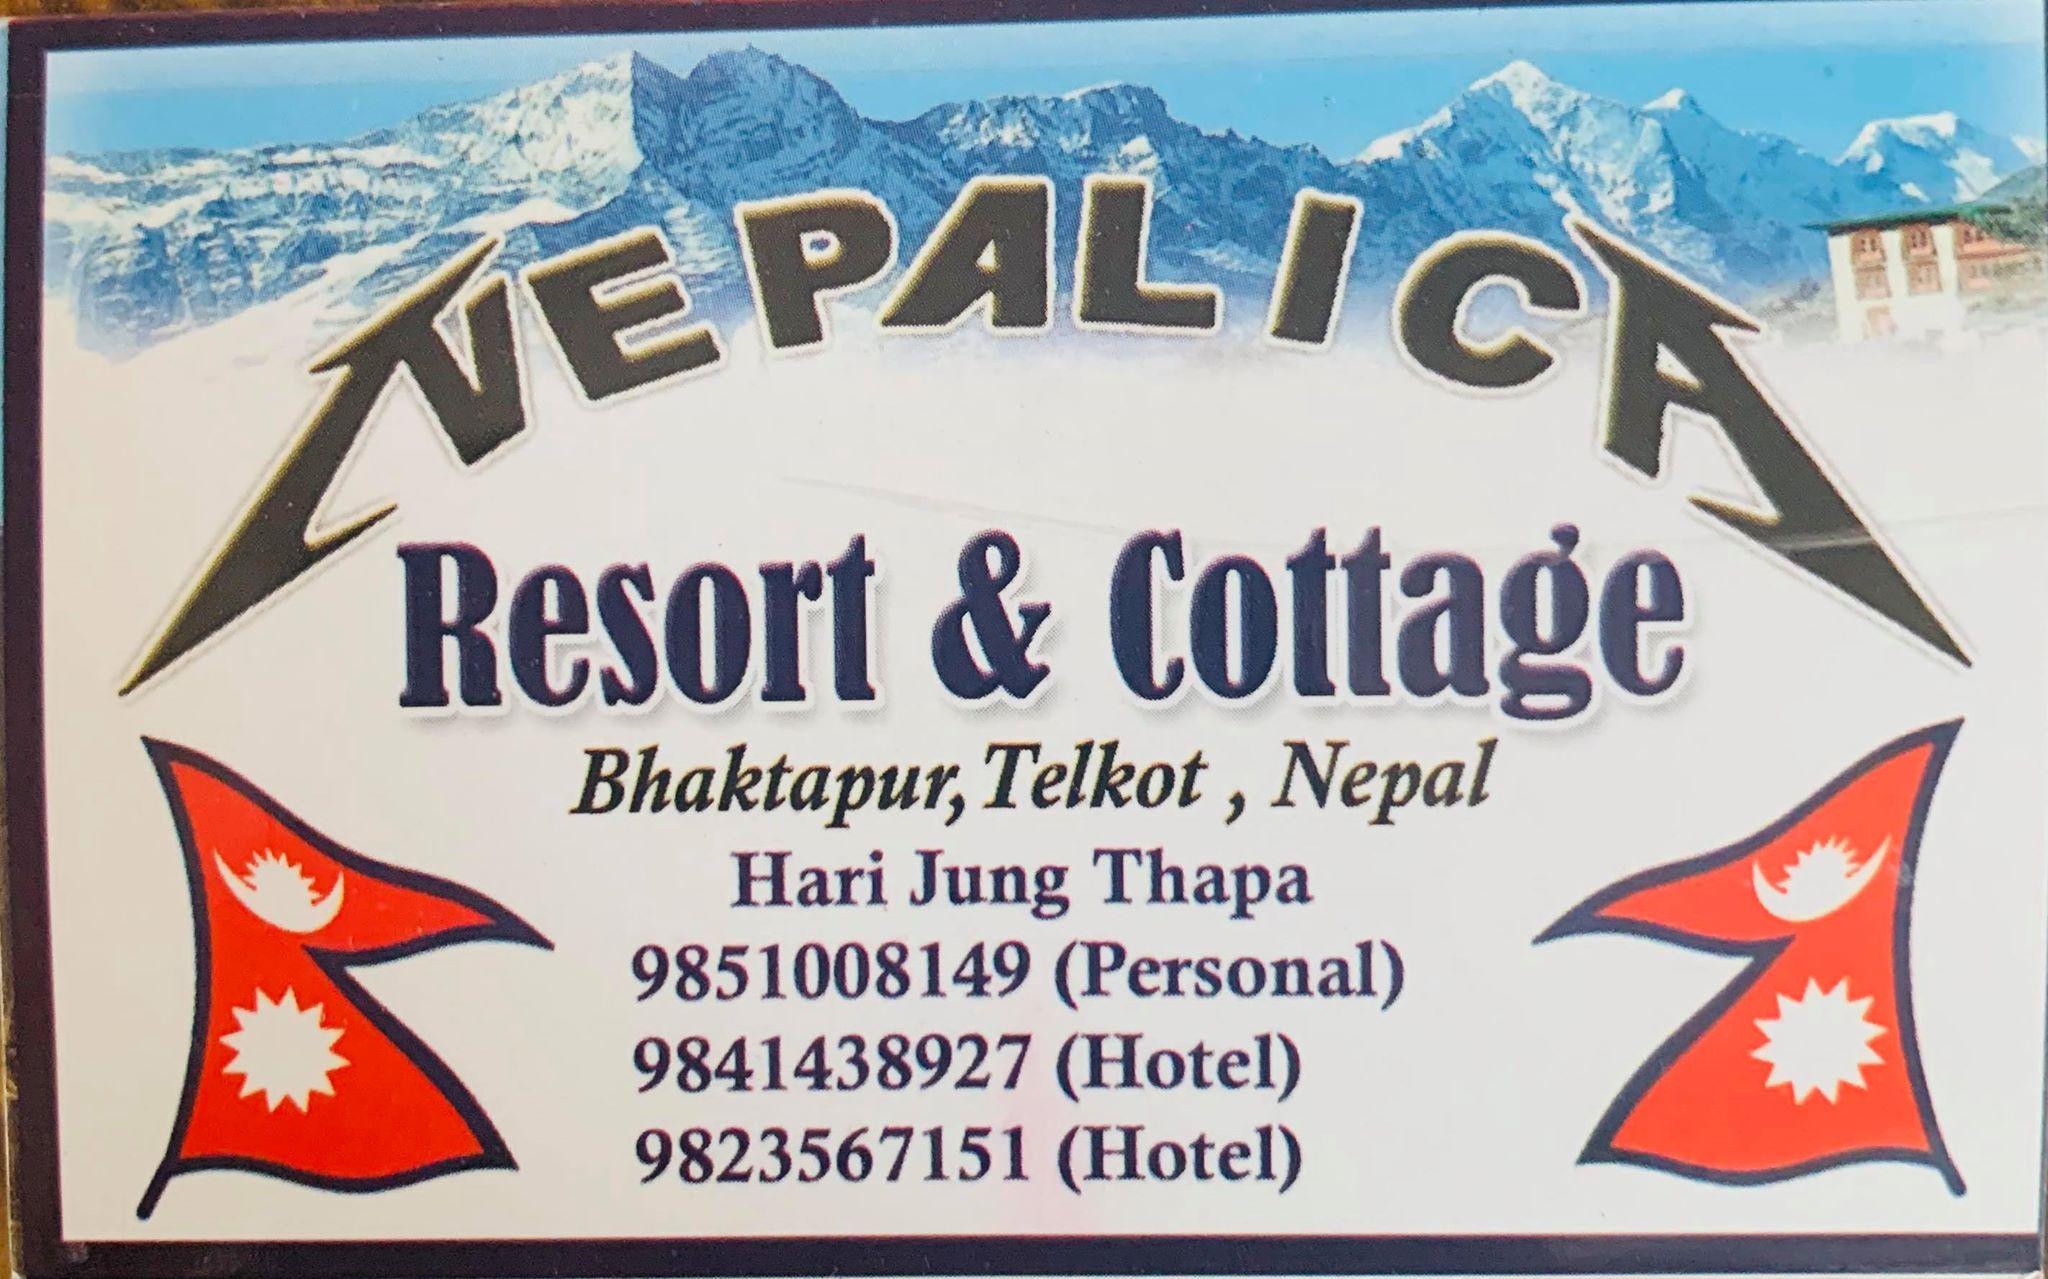 Nepalica Resort and cottage